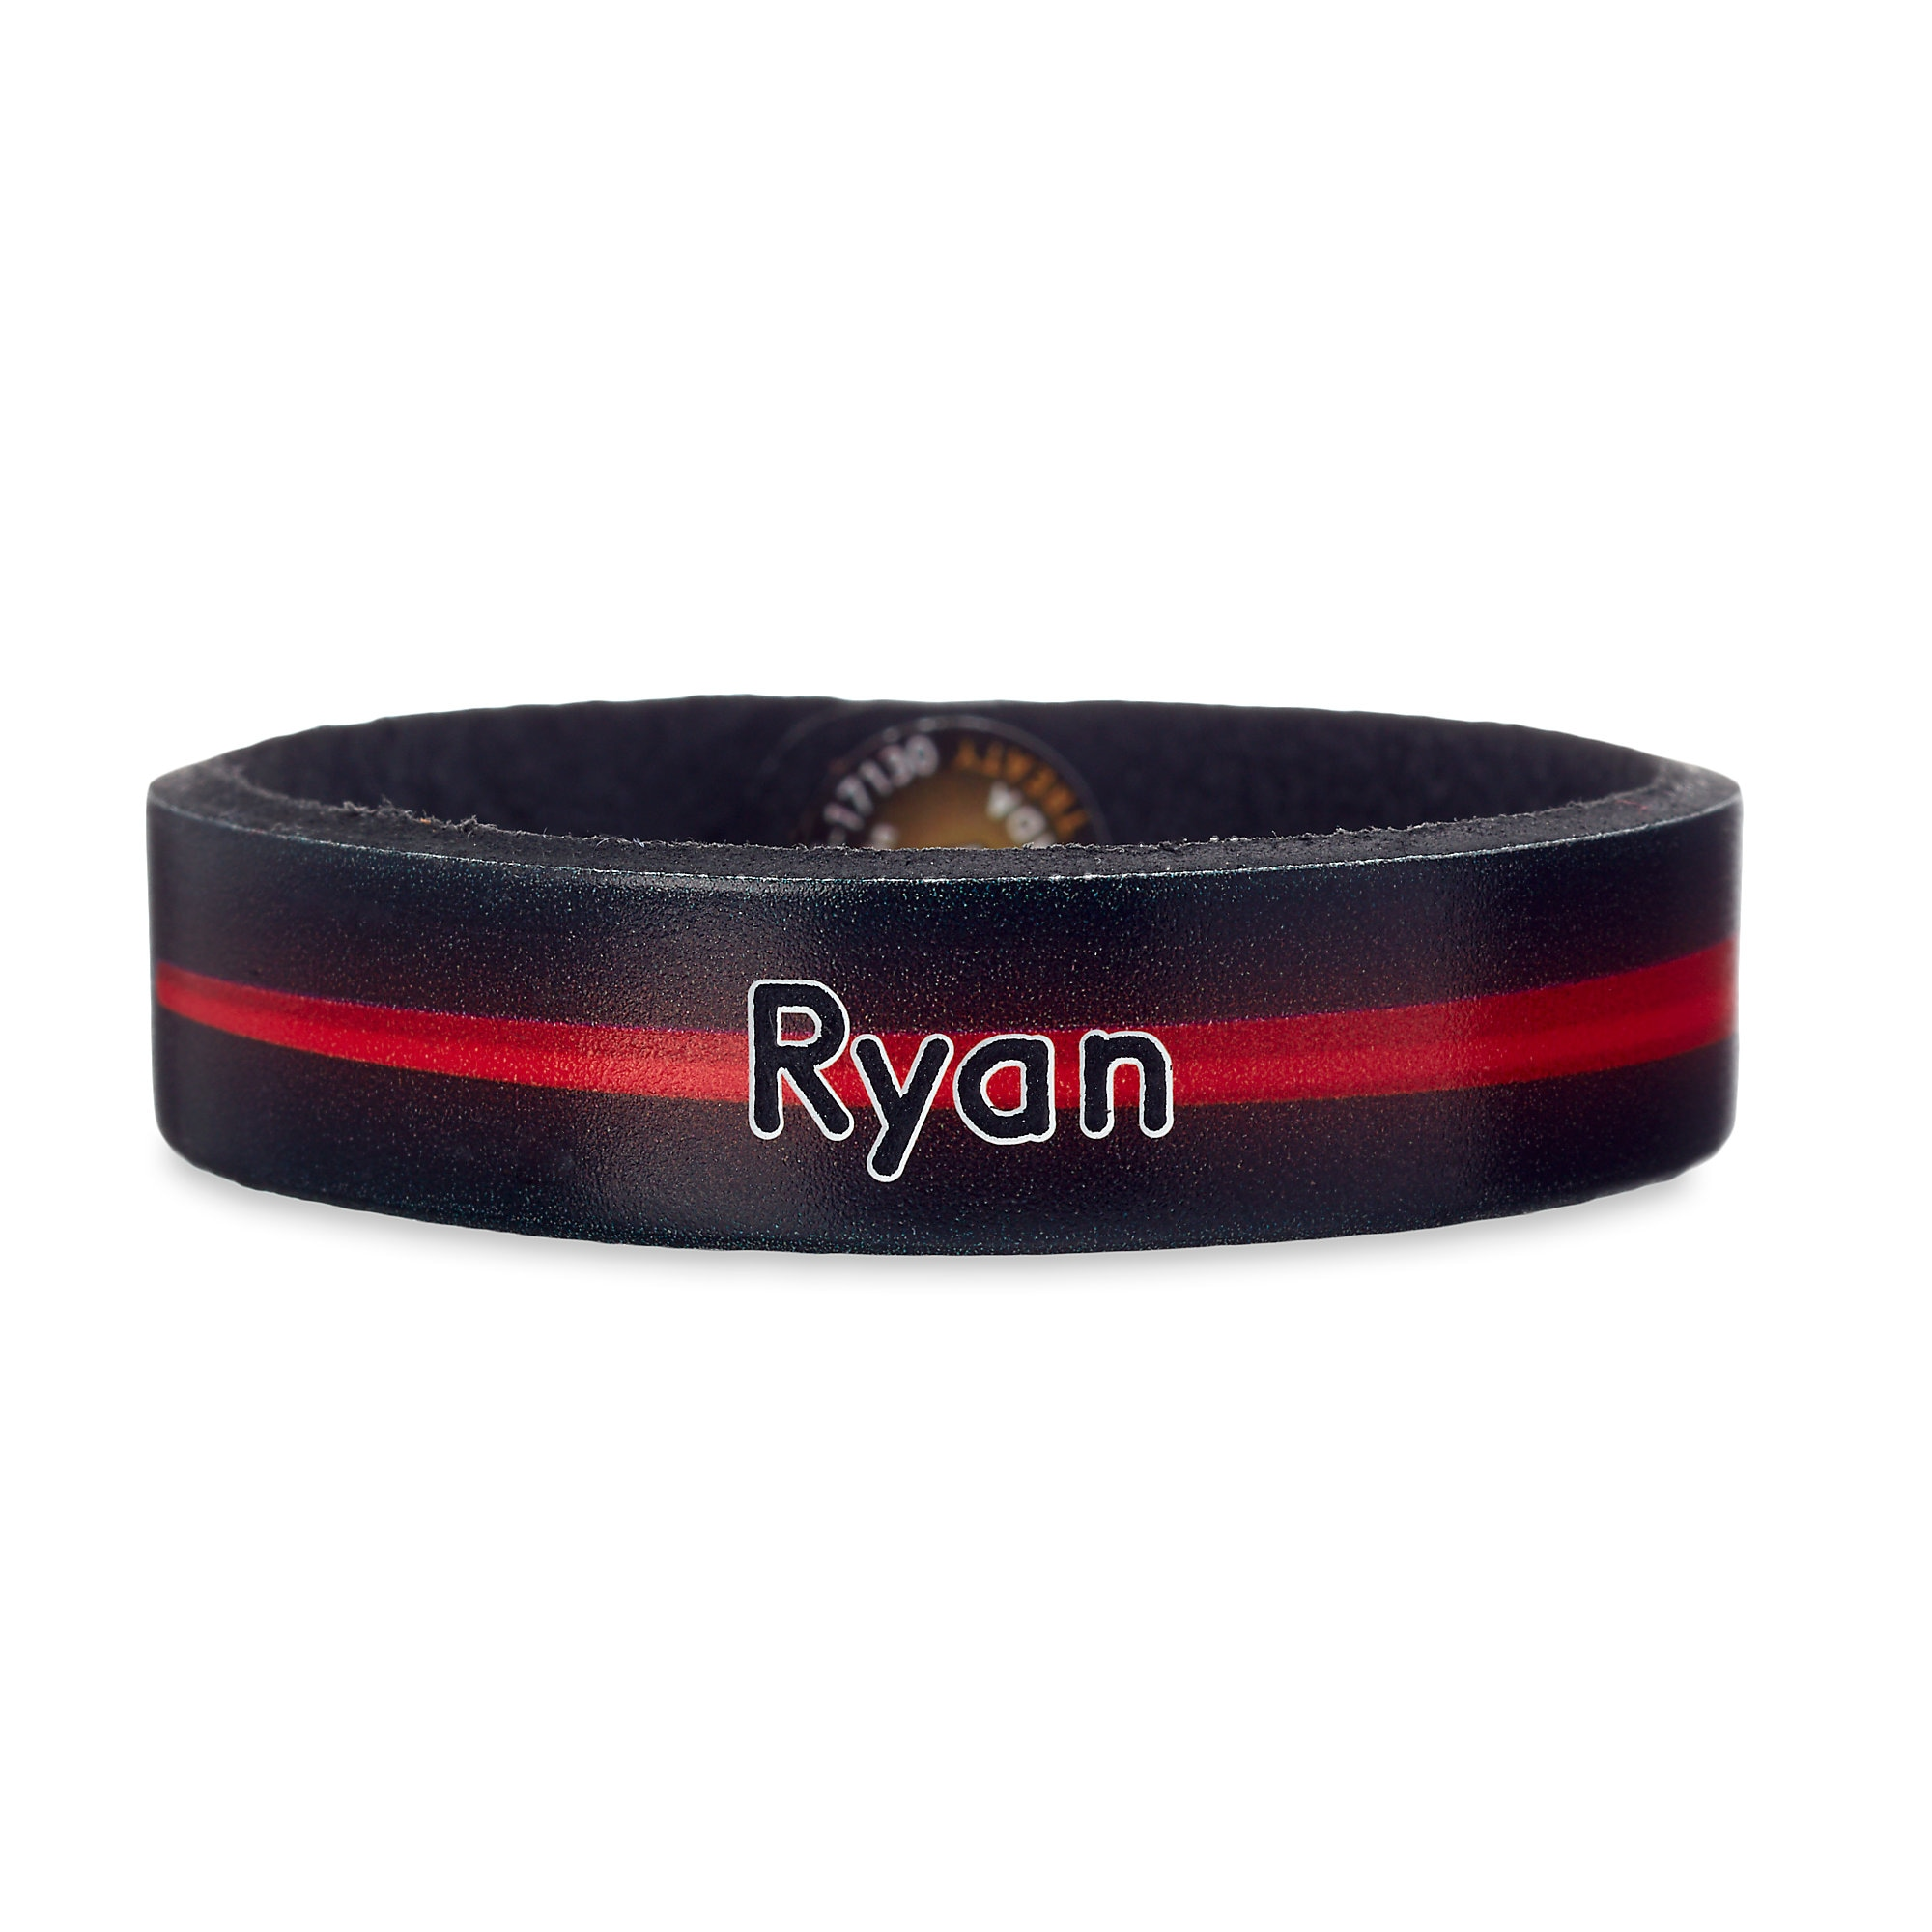 Darth Vader Leather Bracelet - Star Wars - Personalizable